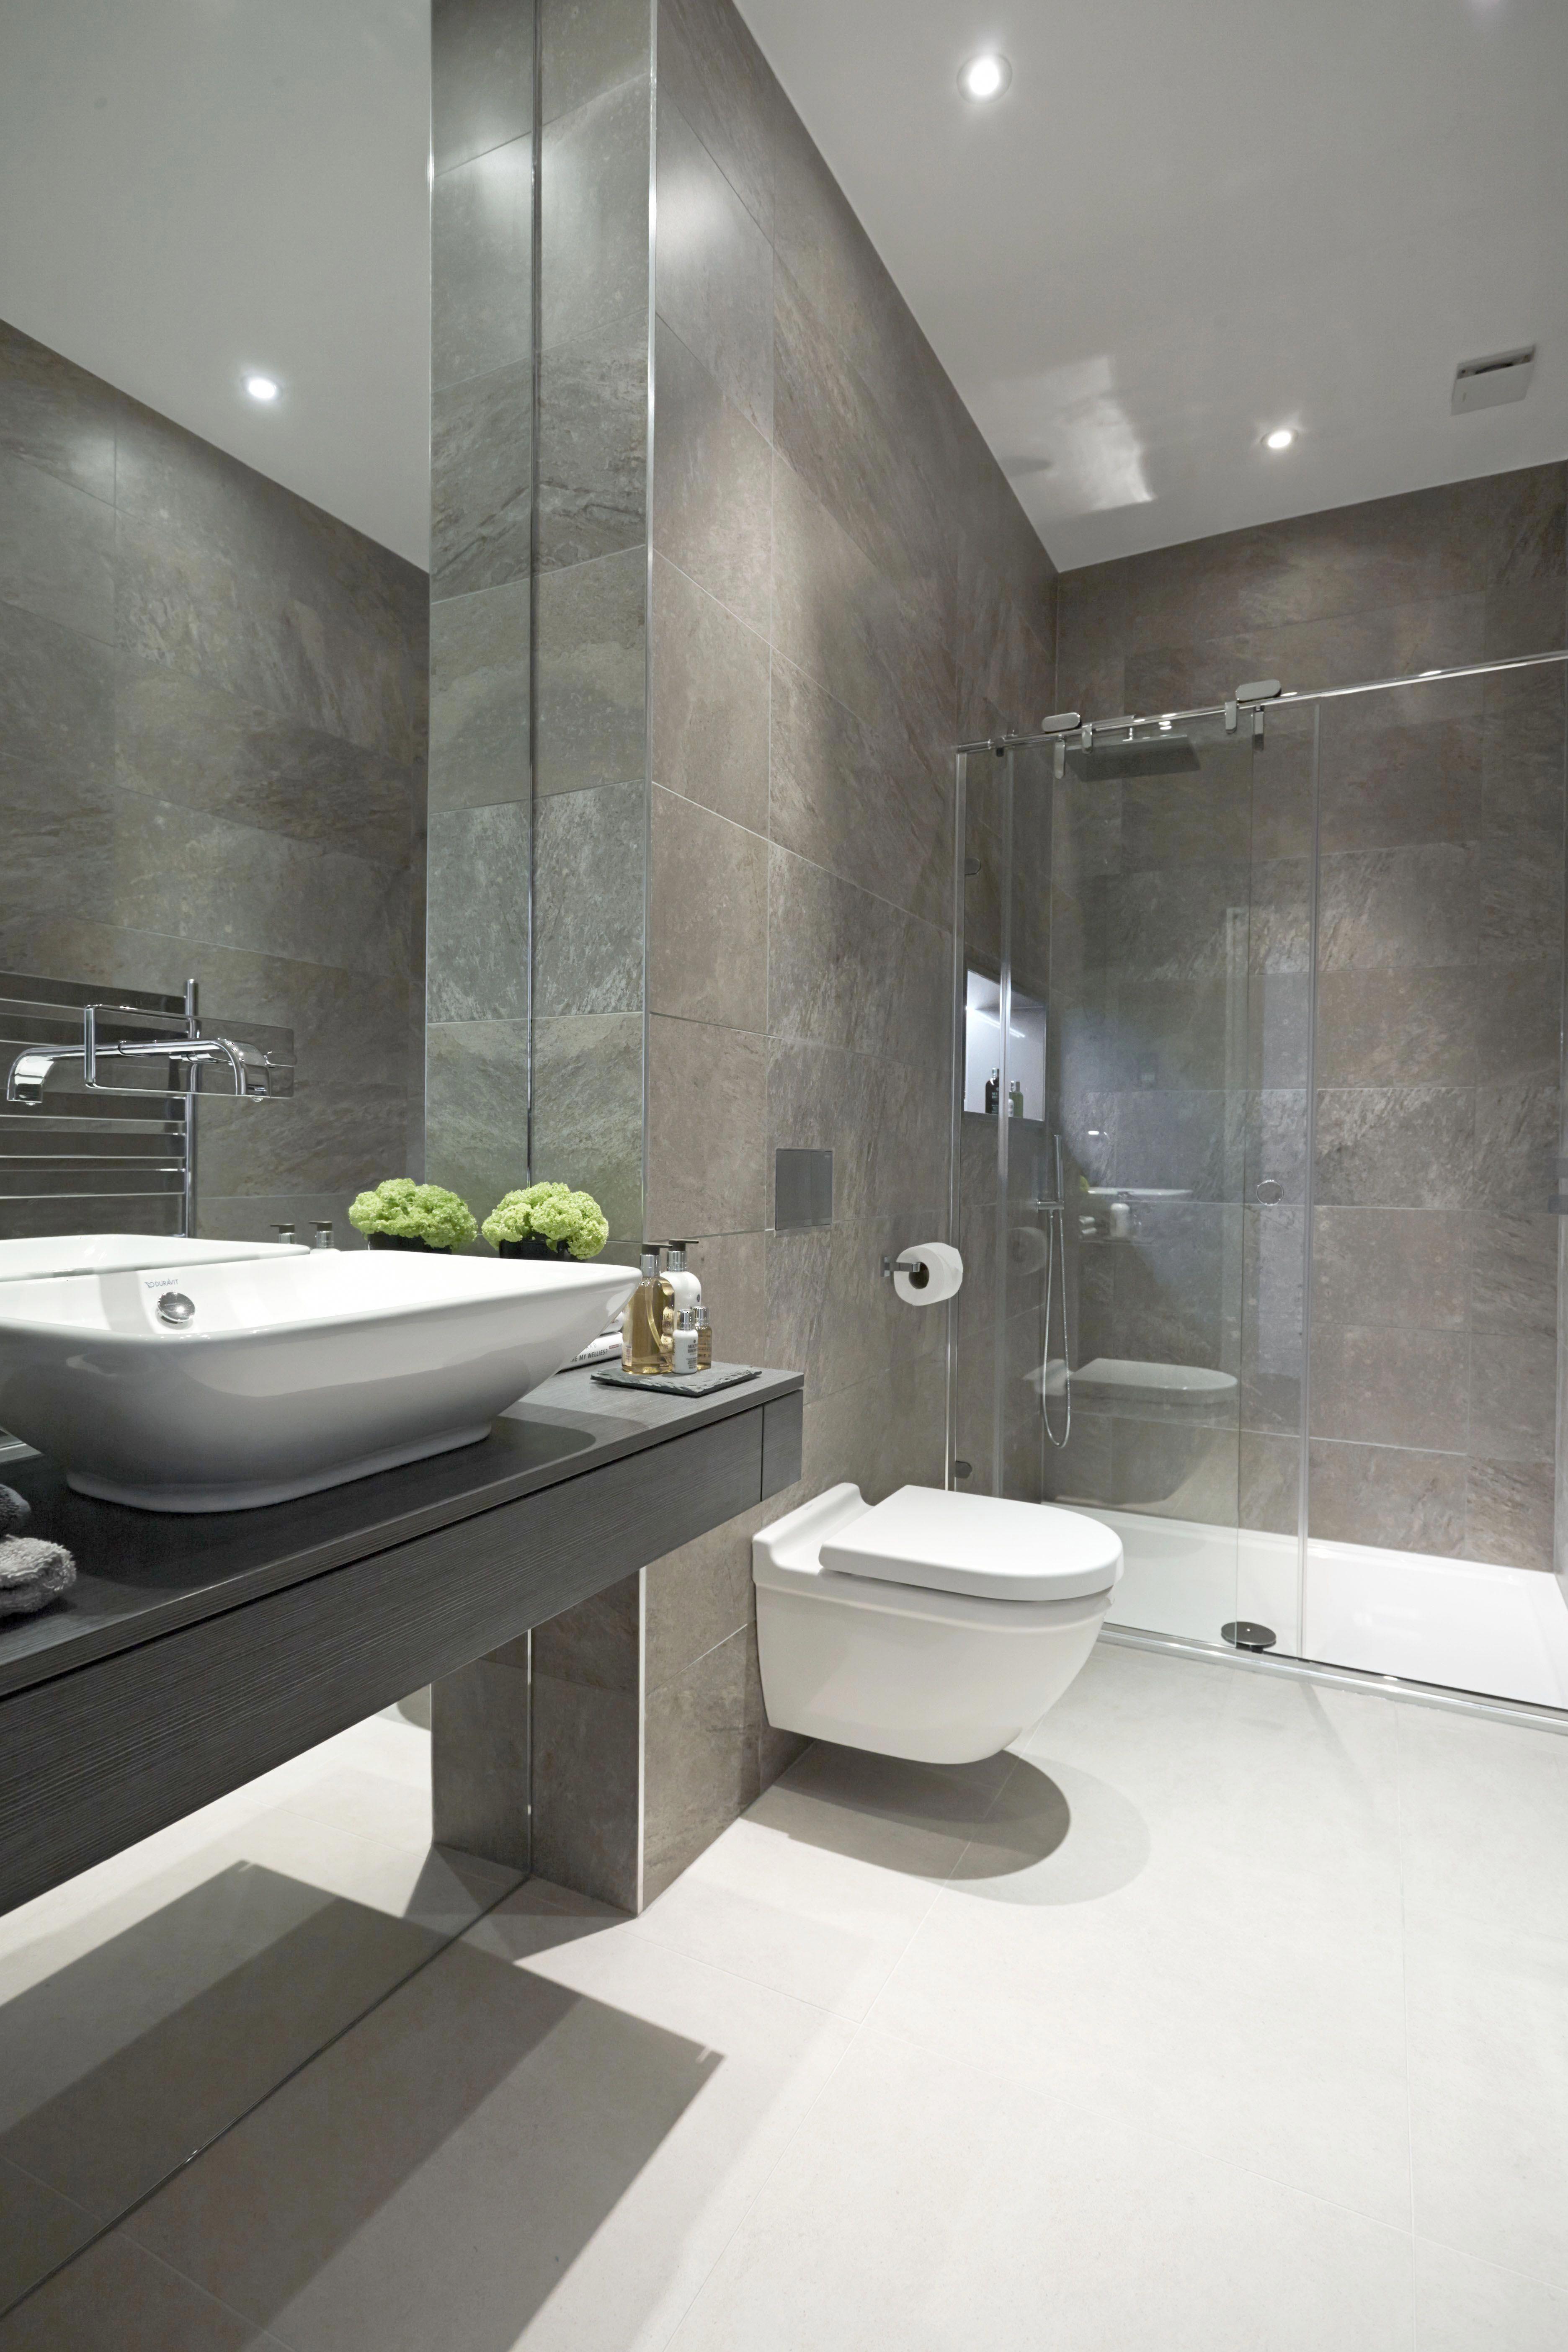 Luxury Bathrooms Fittings Elegant Bathroom Accessories